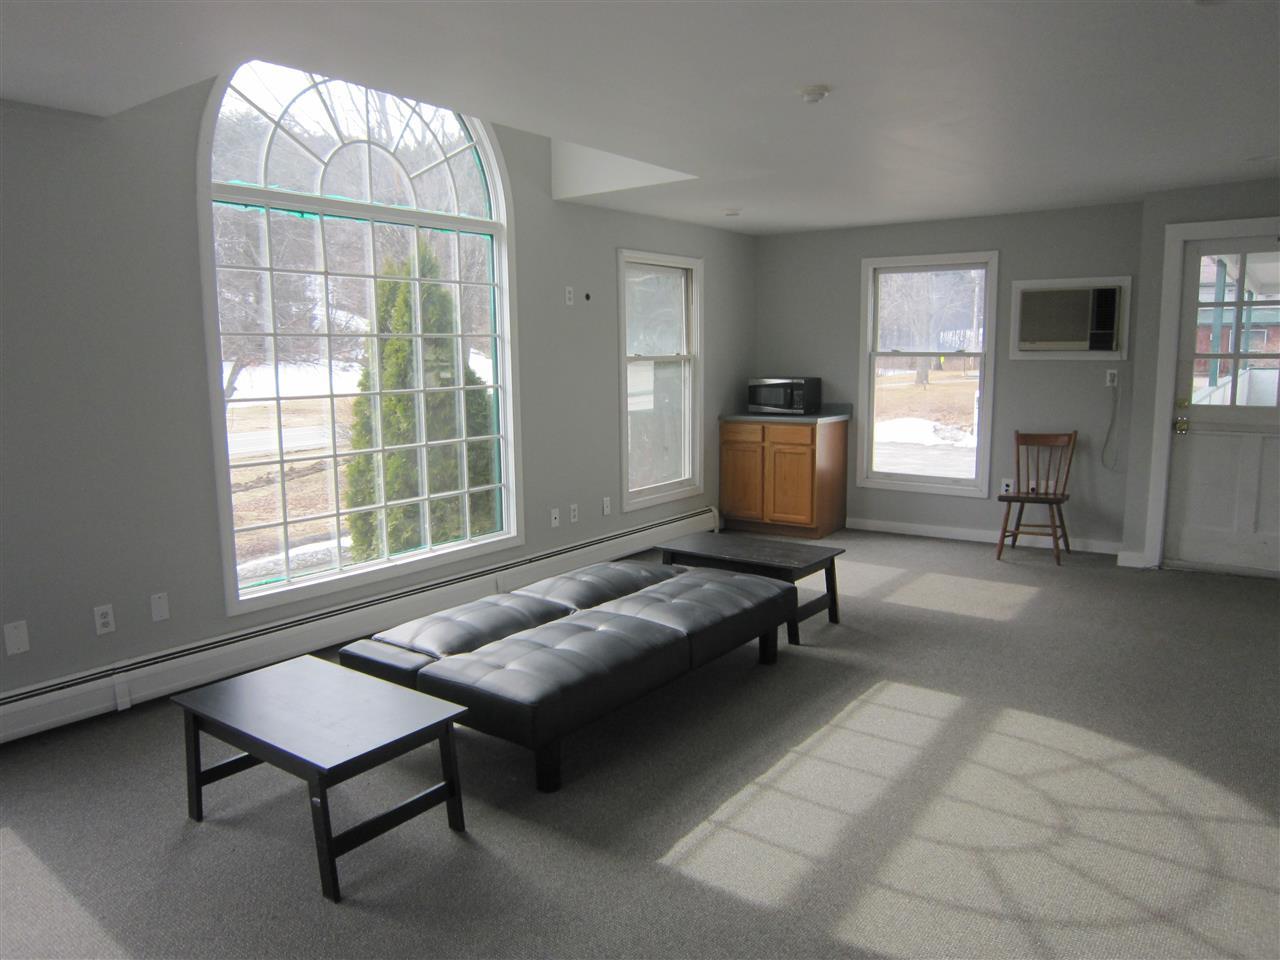 Mount-Snow-Real-Estate-4624810-11